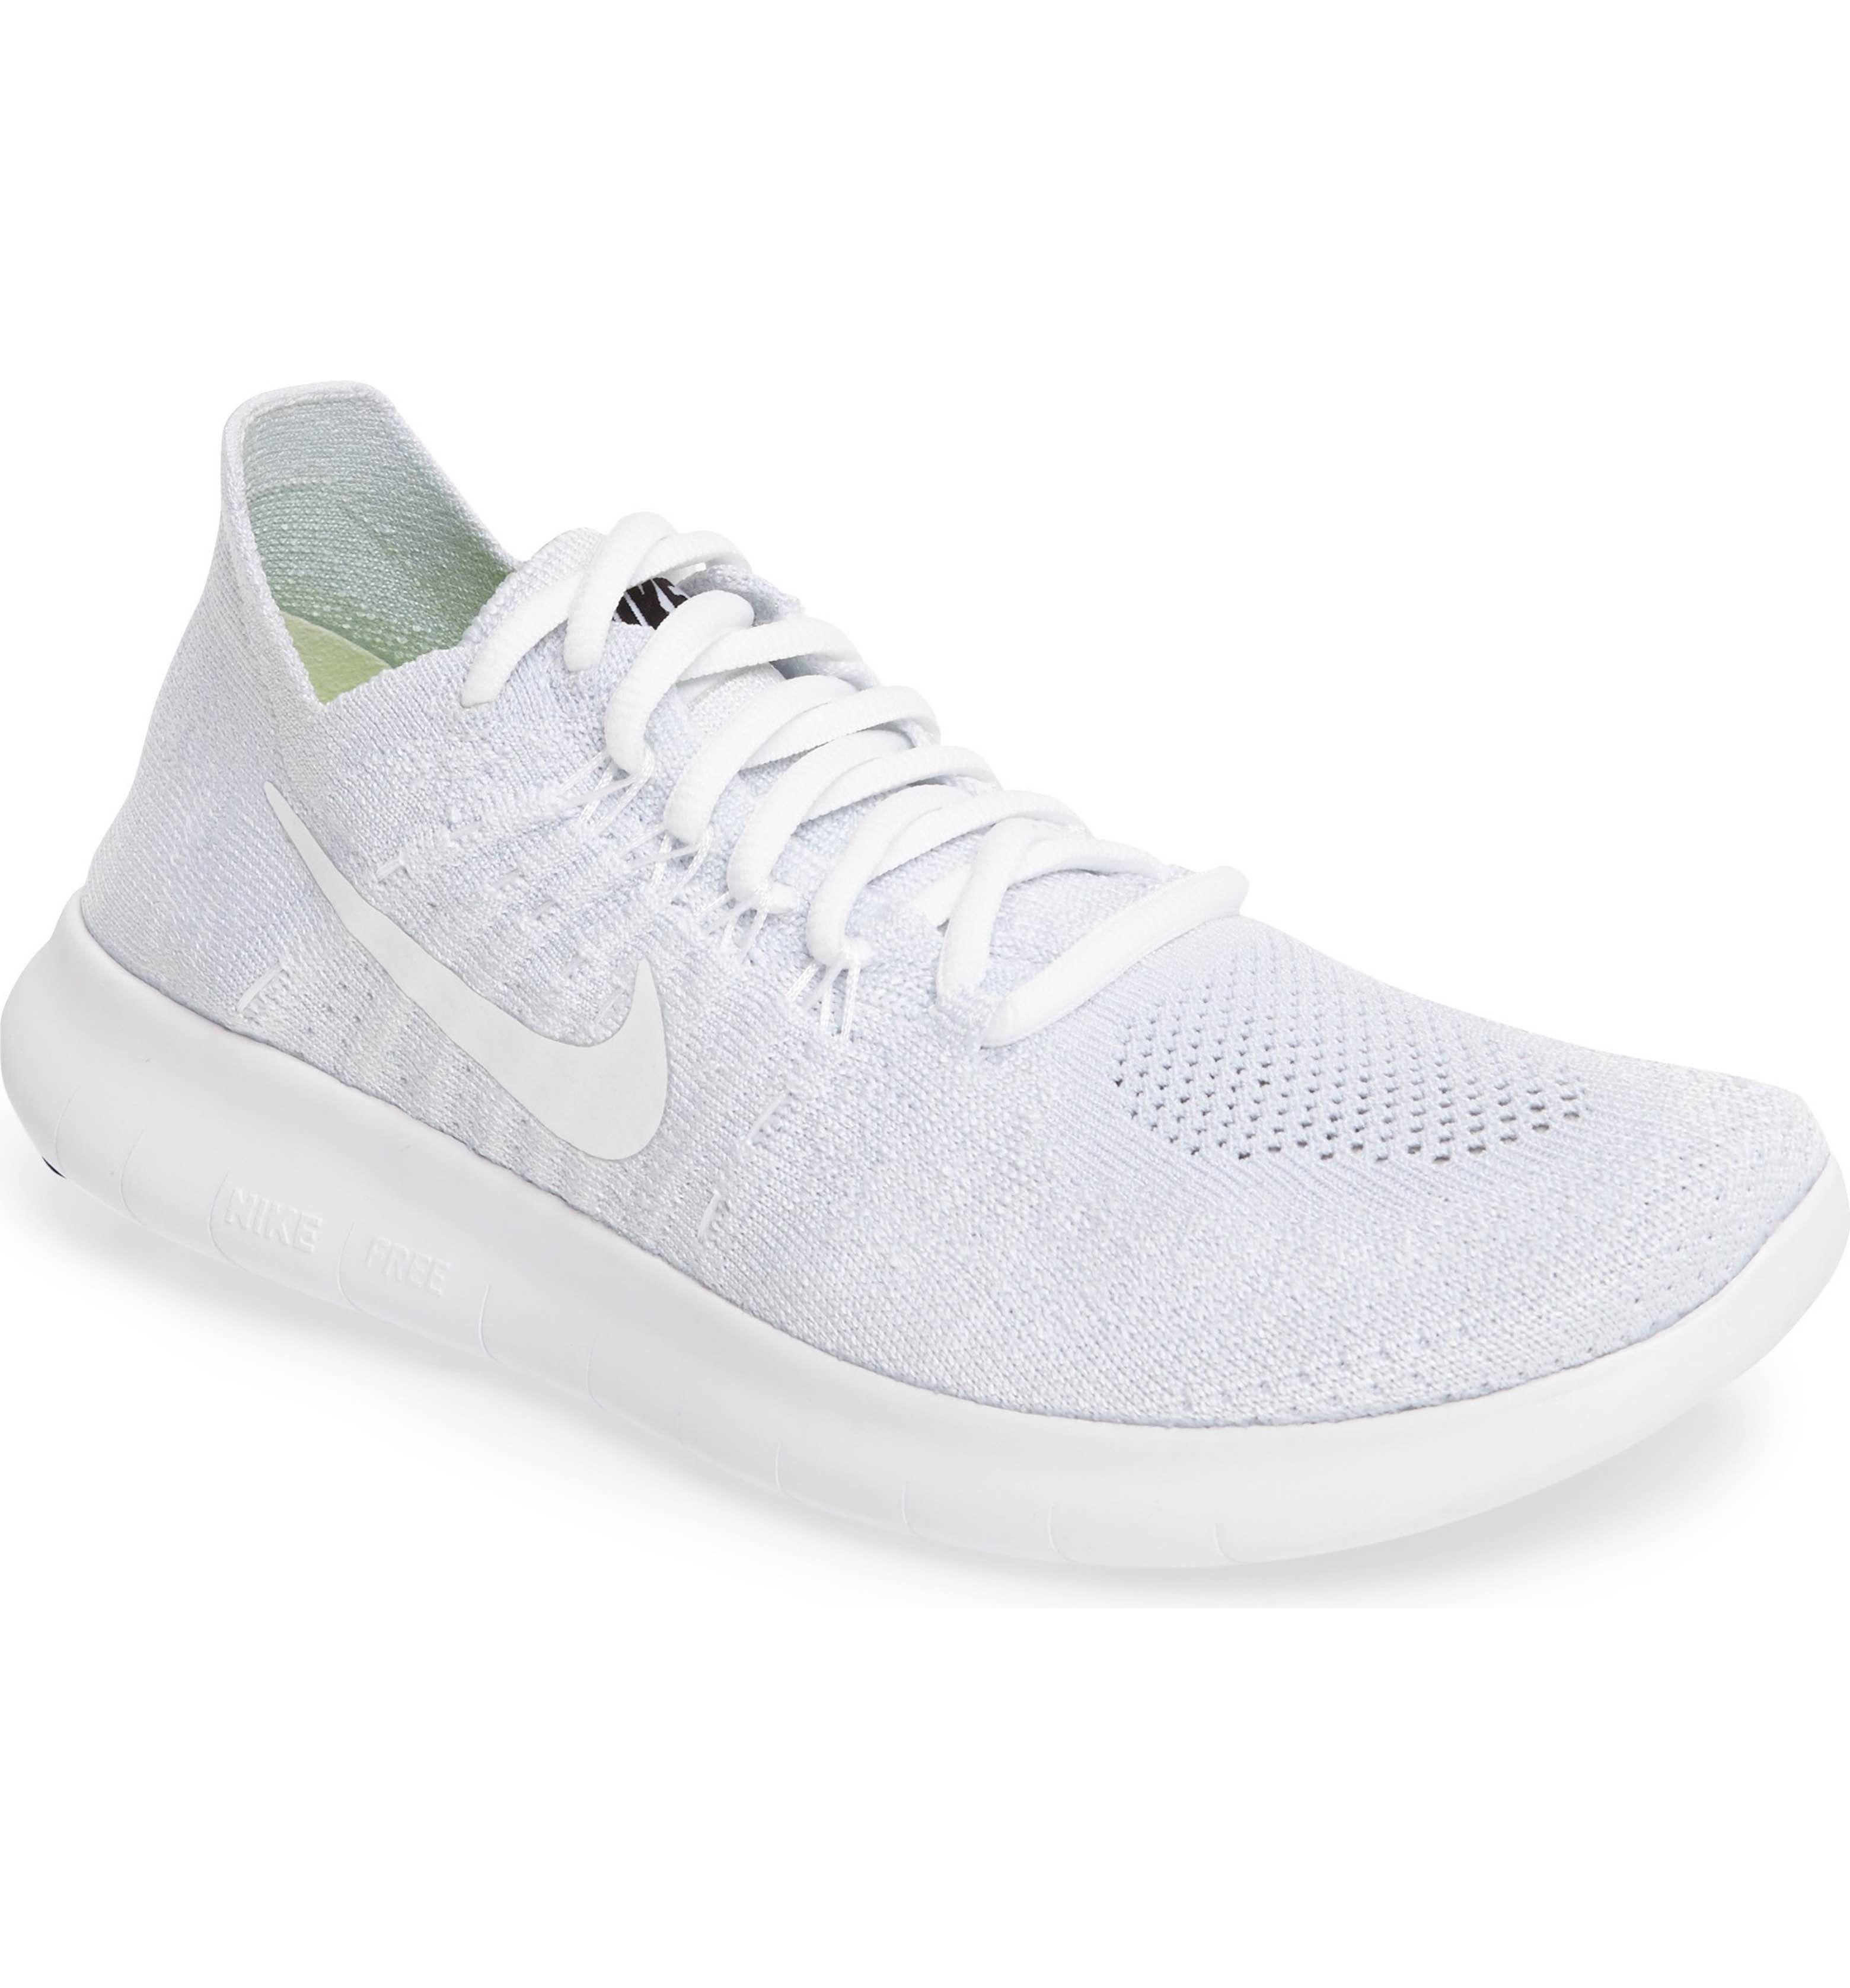 Misión grupo fibra  Main Image - Nike Free Run Flyknit 2 Running Shoe (Women) | Nike free run  flyknit, Running shoes nike free, Shoes with jeans